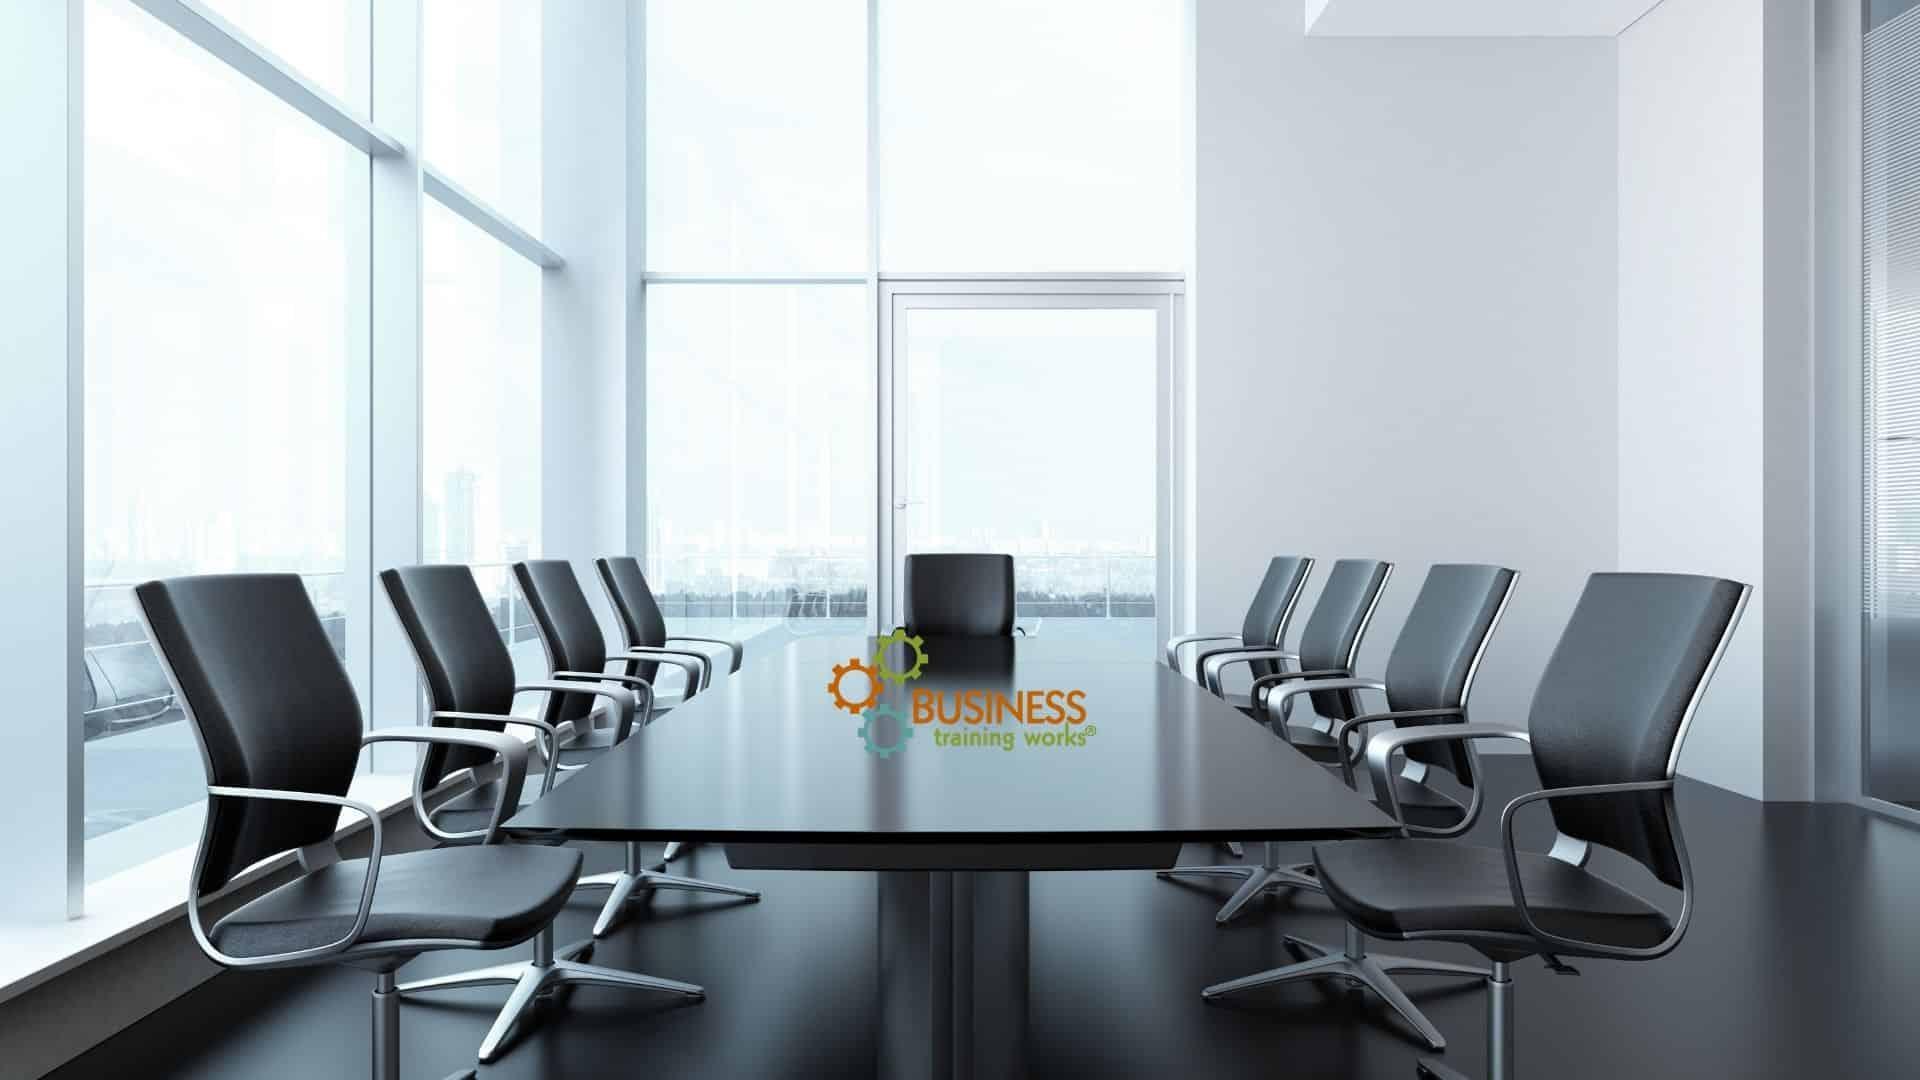 Improve Your Team's Virtual Meetings